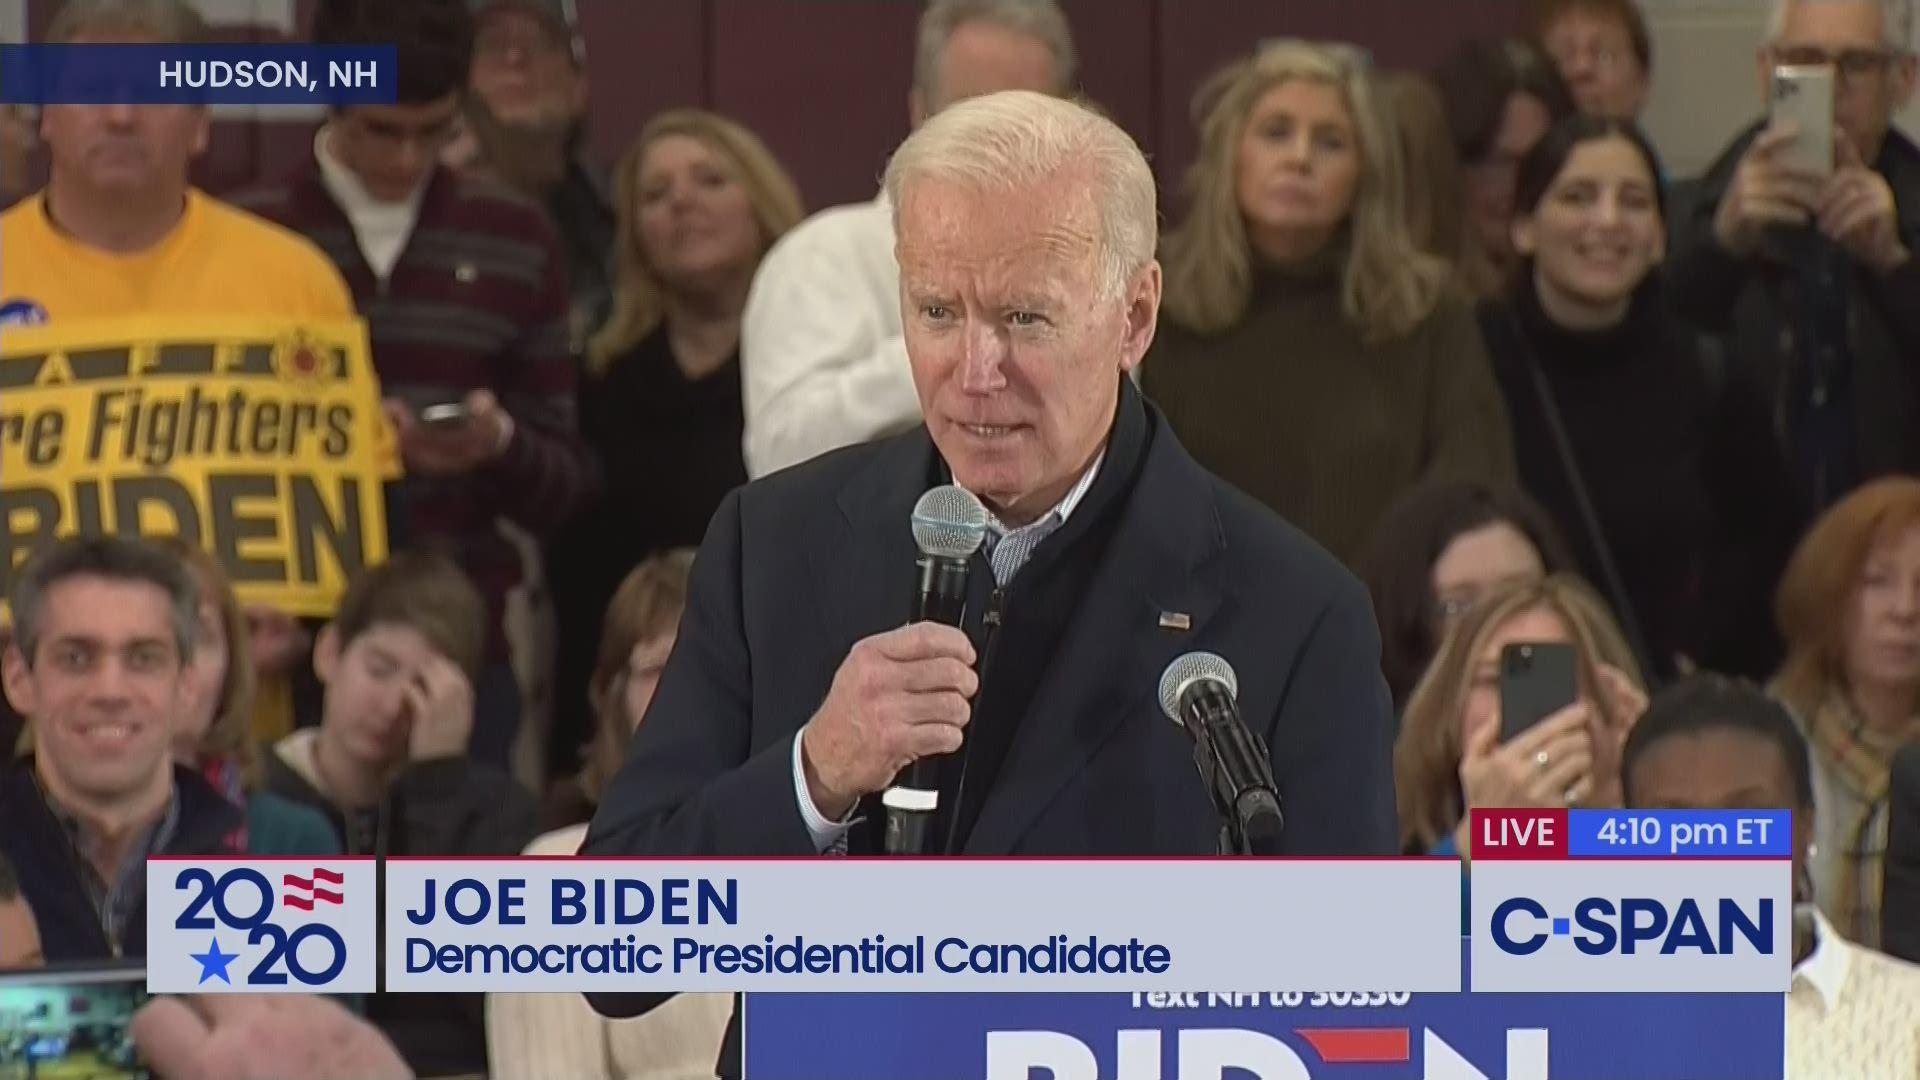 Joe Biden Campaign Event In Hudson New Hampshire C Span Org